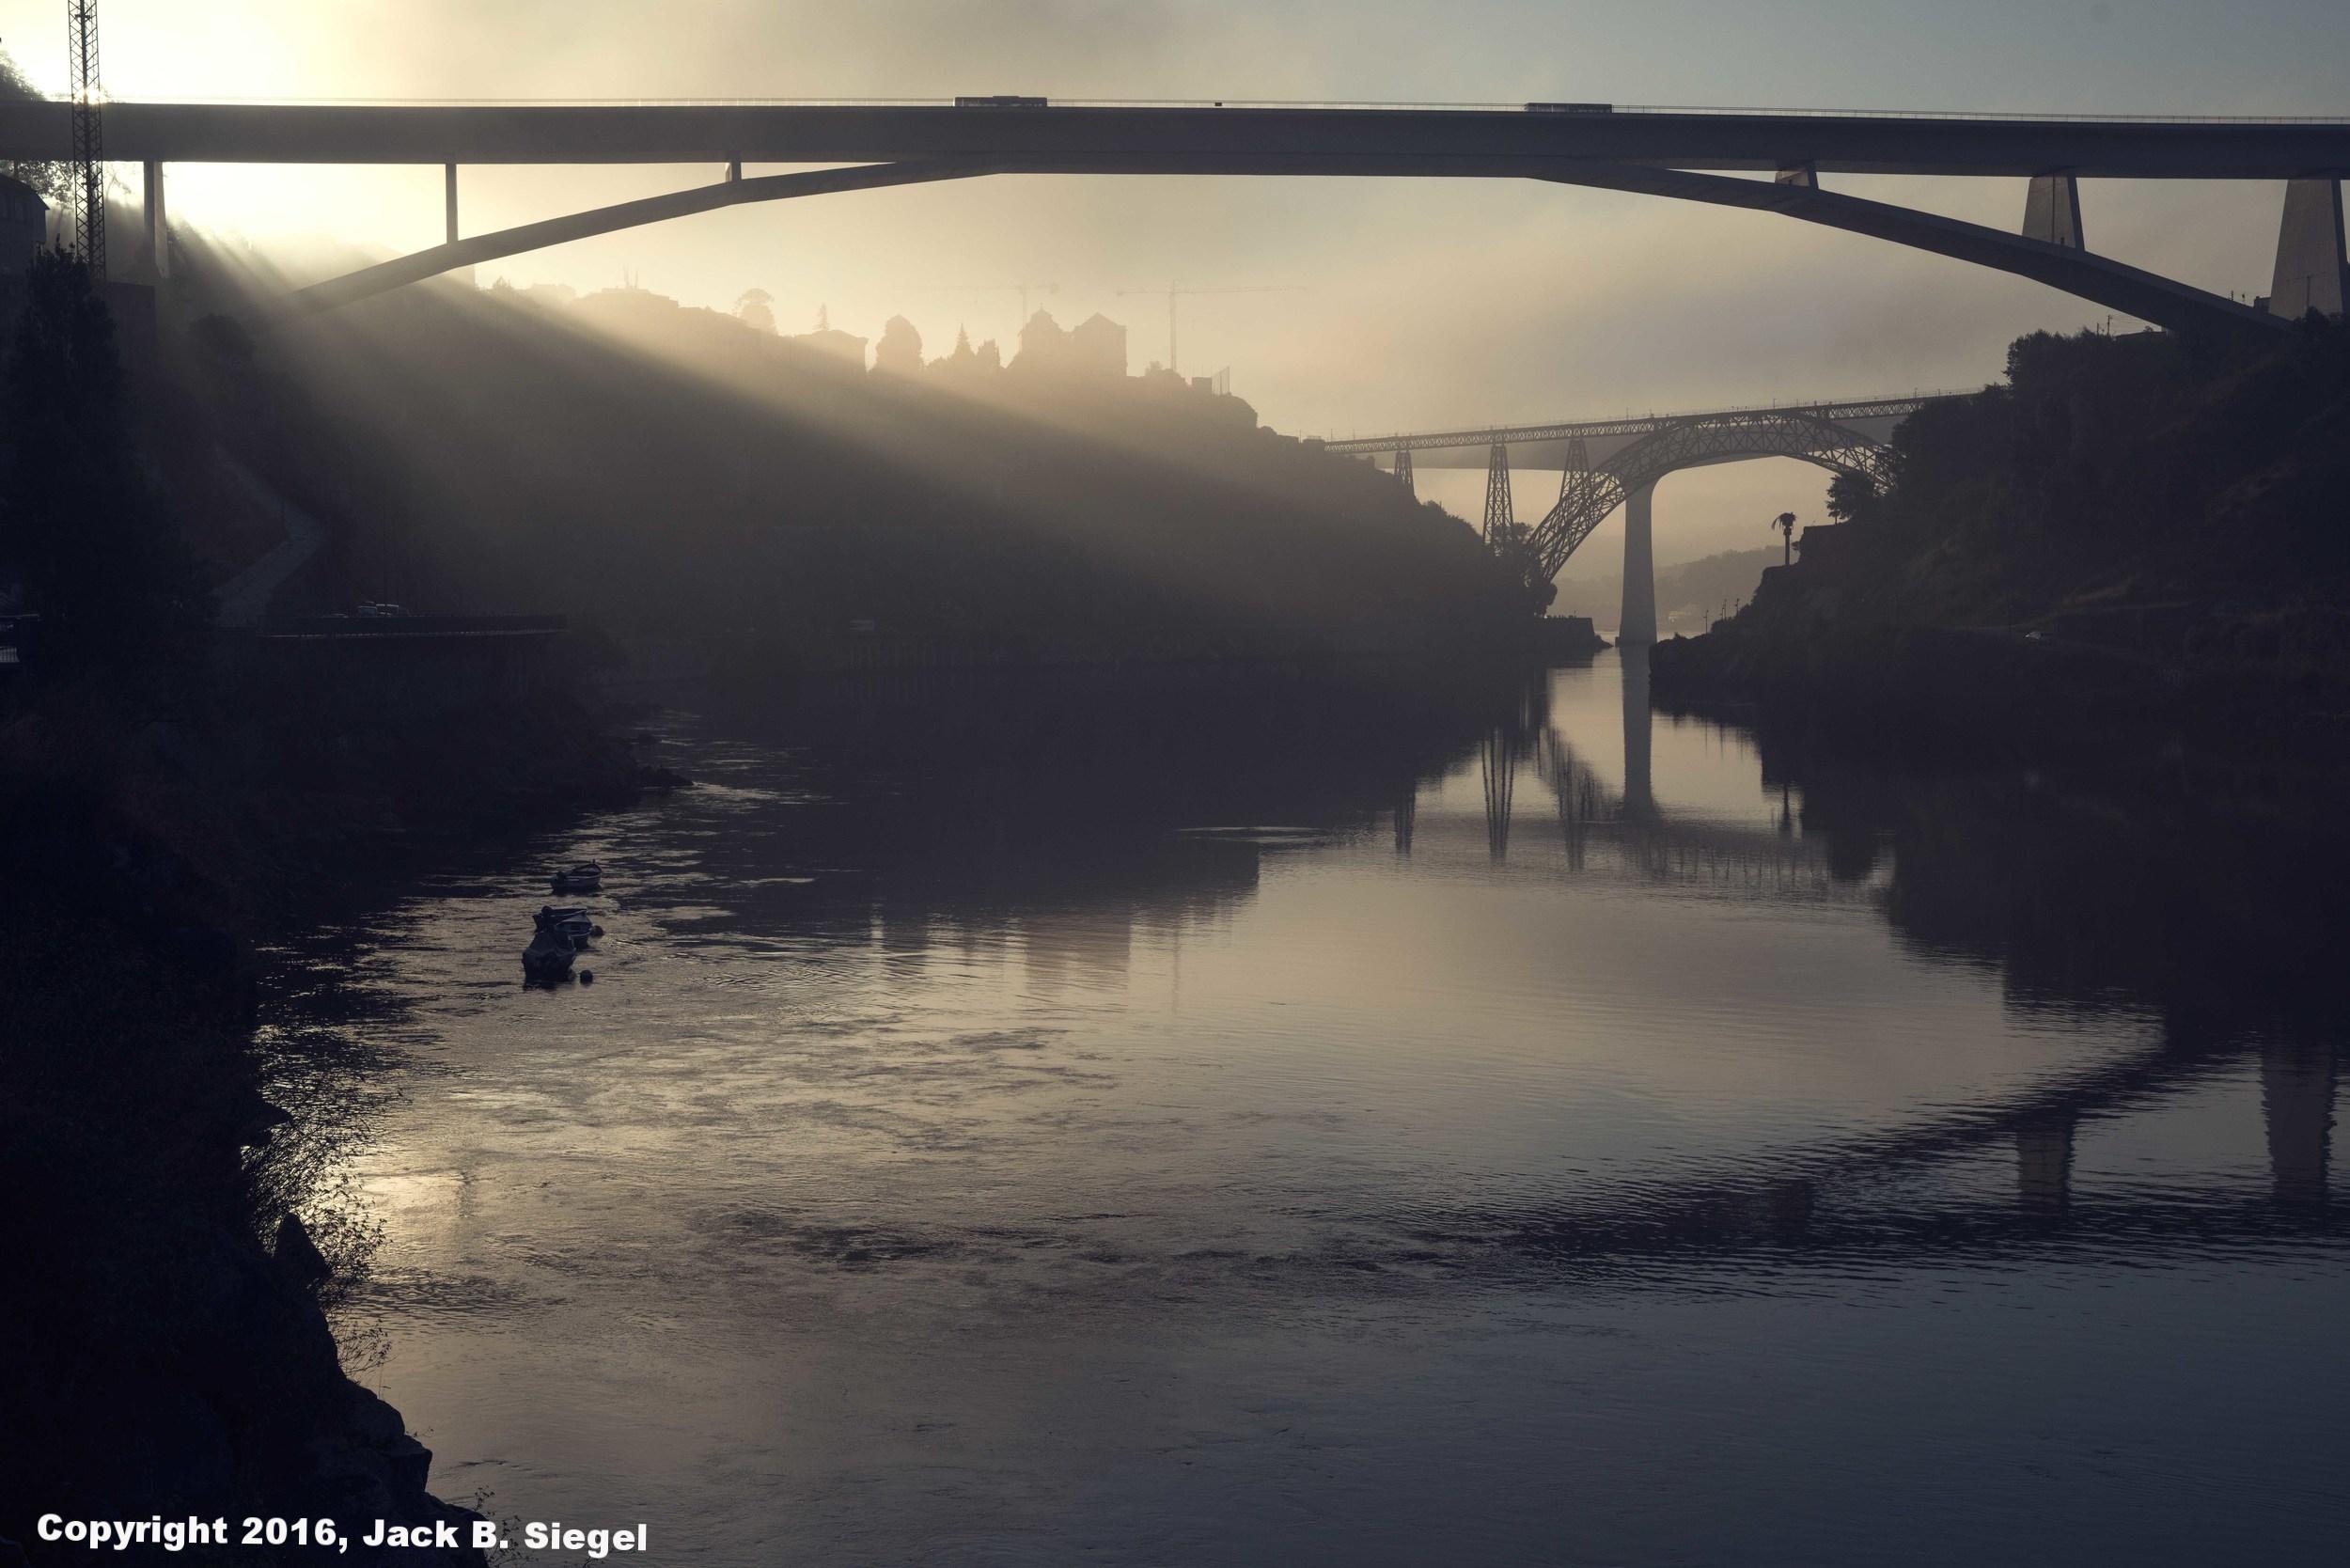 Overlapping Bridges